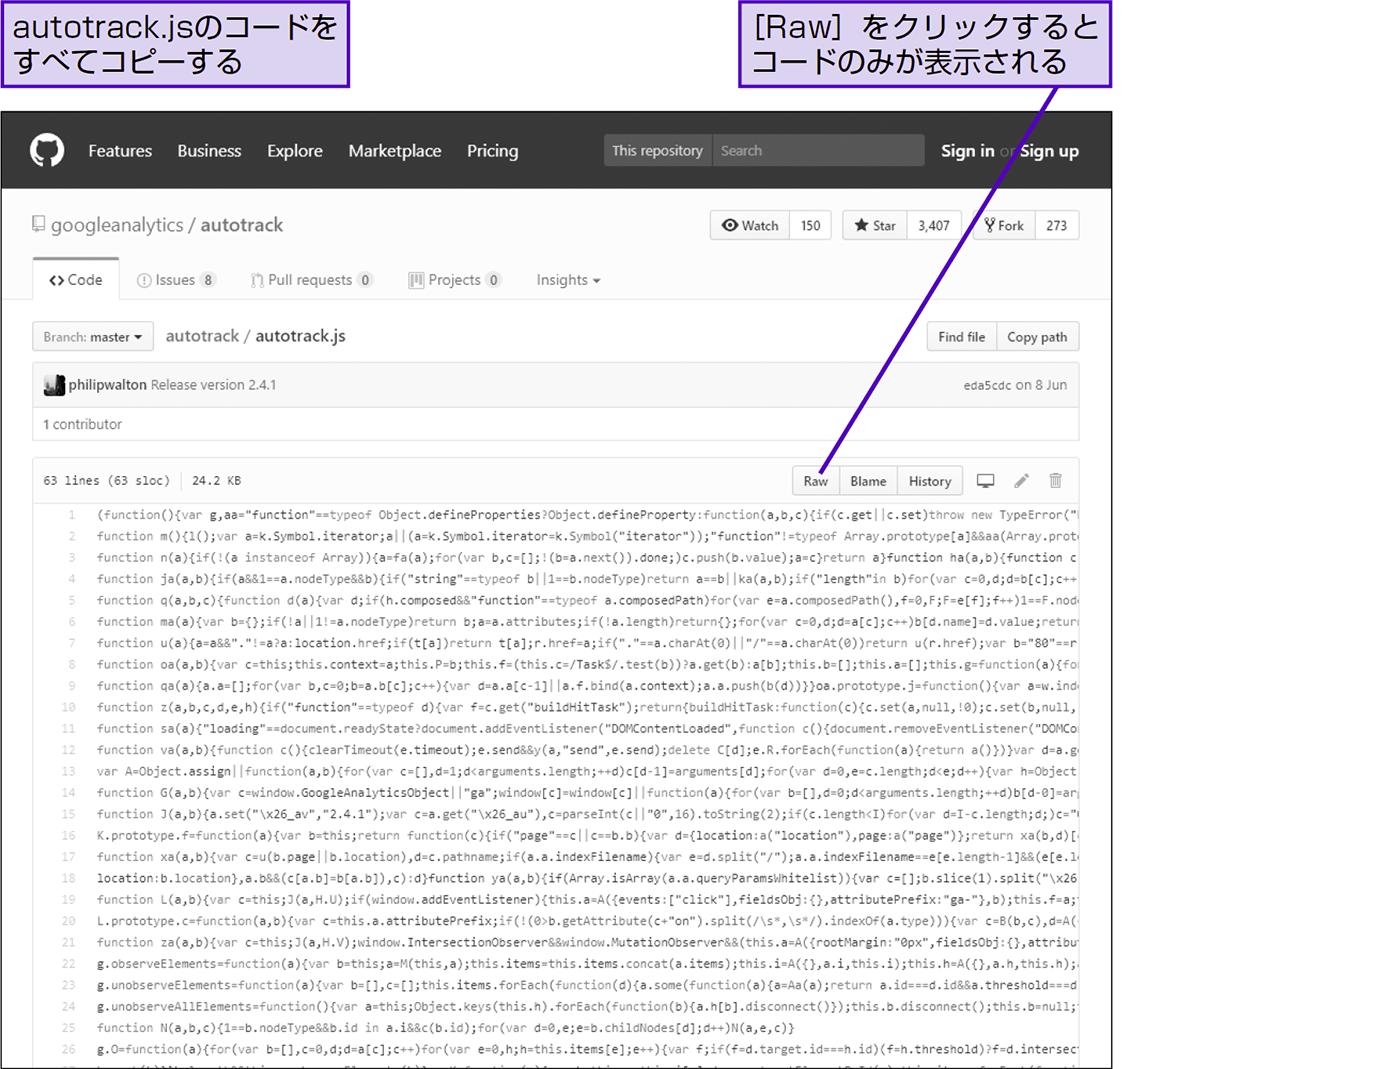 Google公式のプラグインでイベントトラッキングを実装する - できる逆引き Googleアナリティクス 増補改訂2版